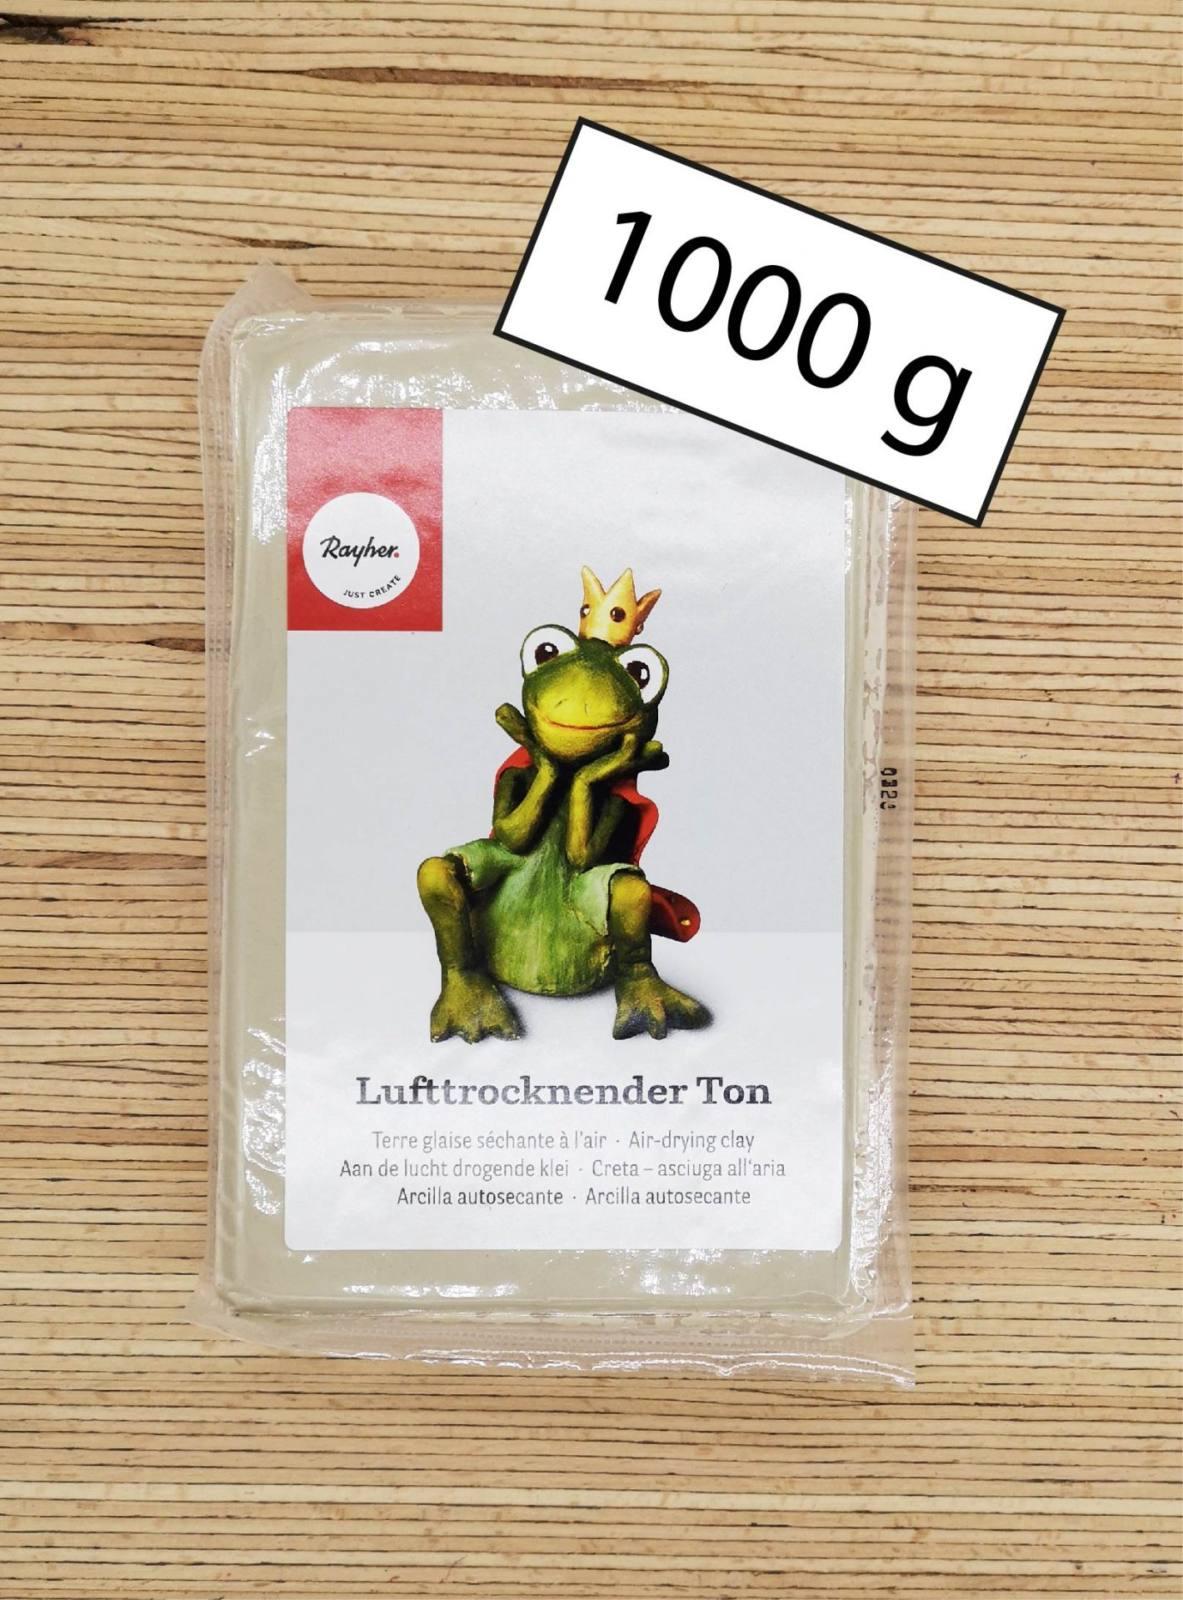 1000g lufttrocknender Ton-01